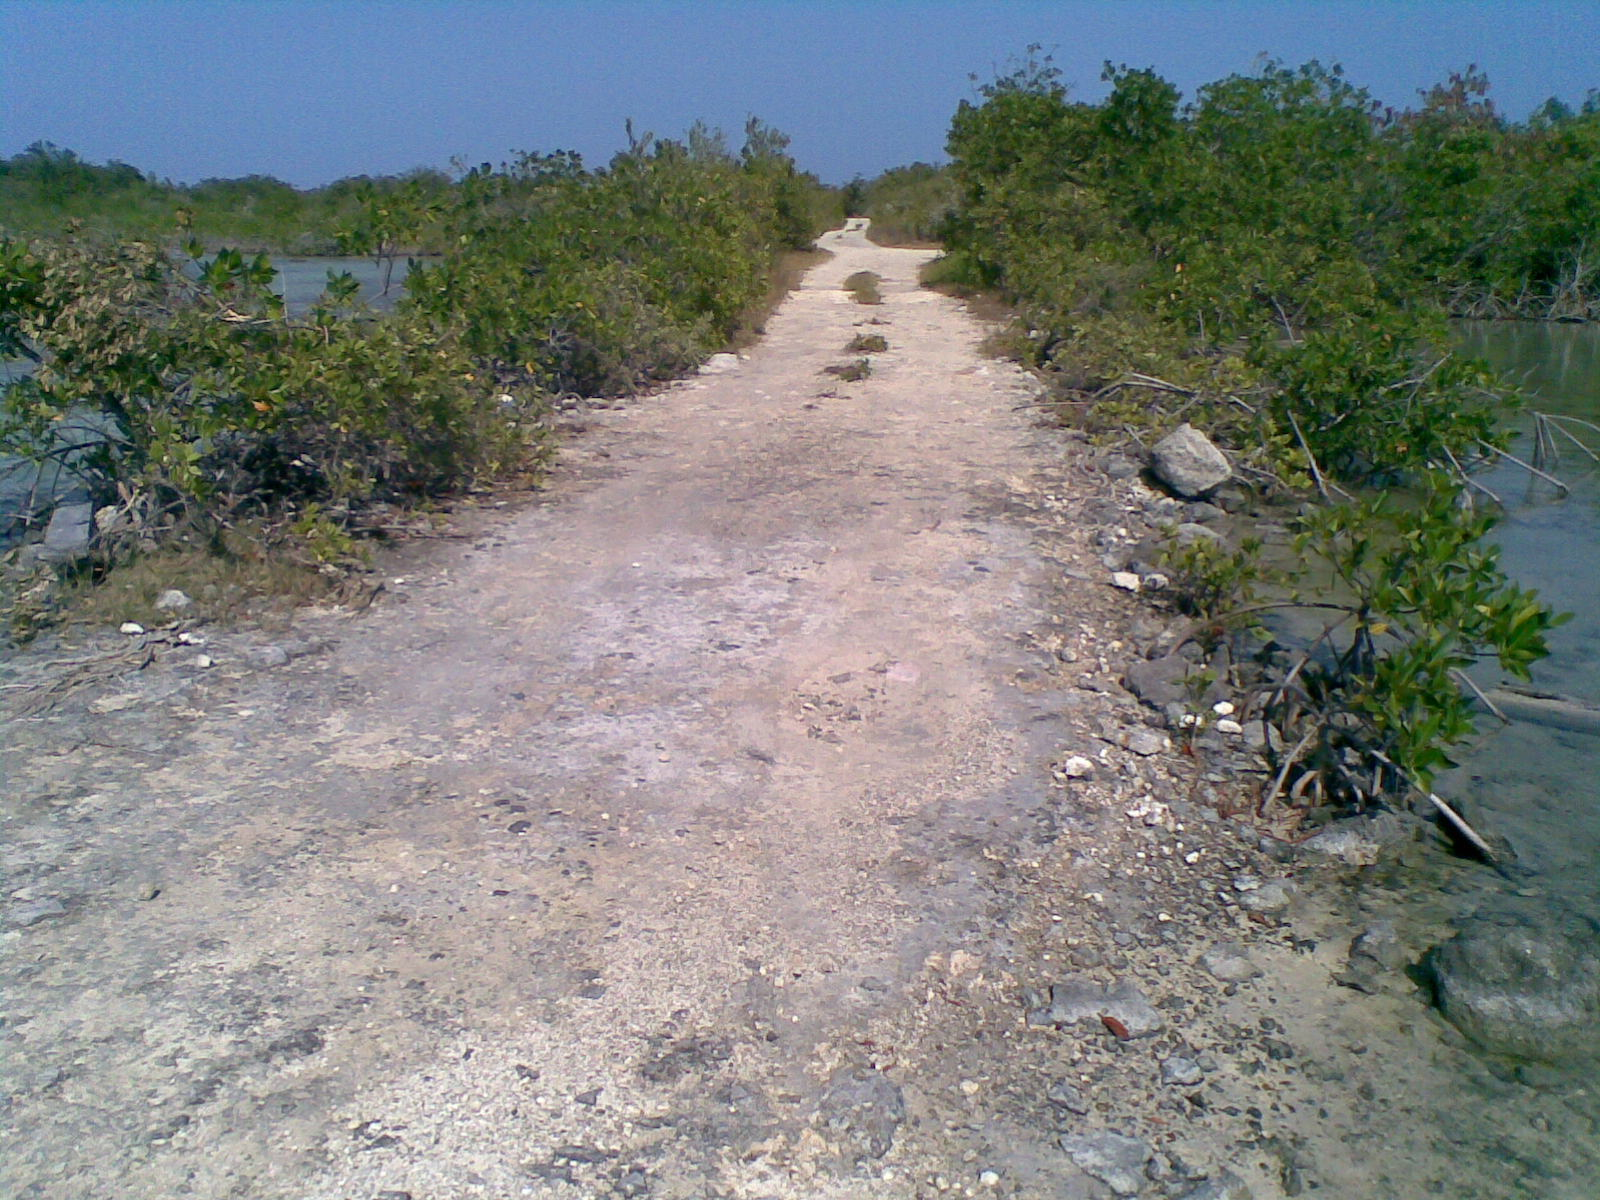 A road in La Aguada, near where Ron was last seen. - Photo taken by Private Investigator Steve Aguirre.